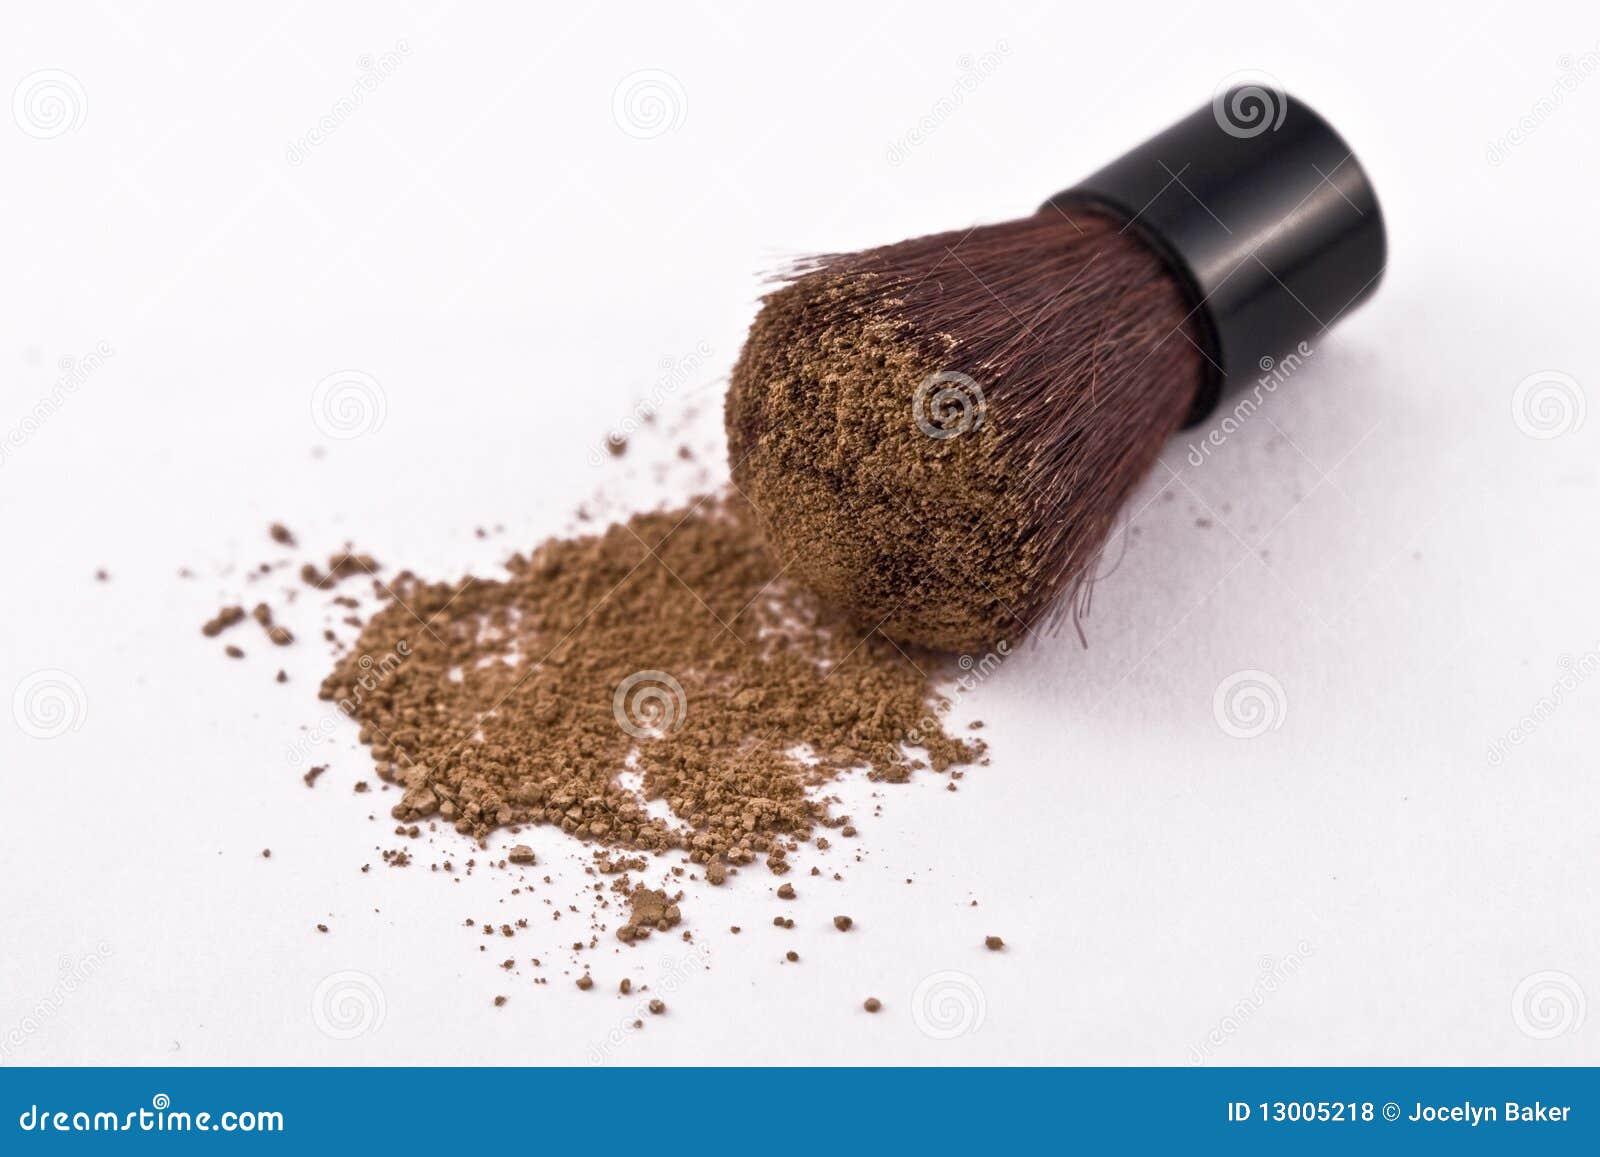 Mica Powder Cosmetics with Brush.